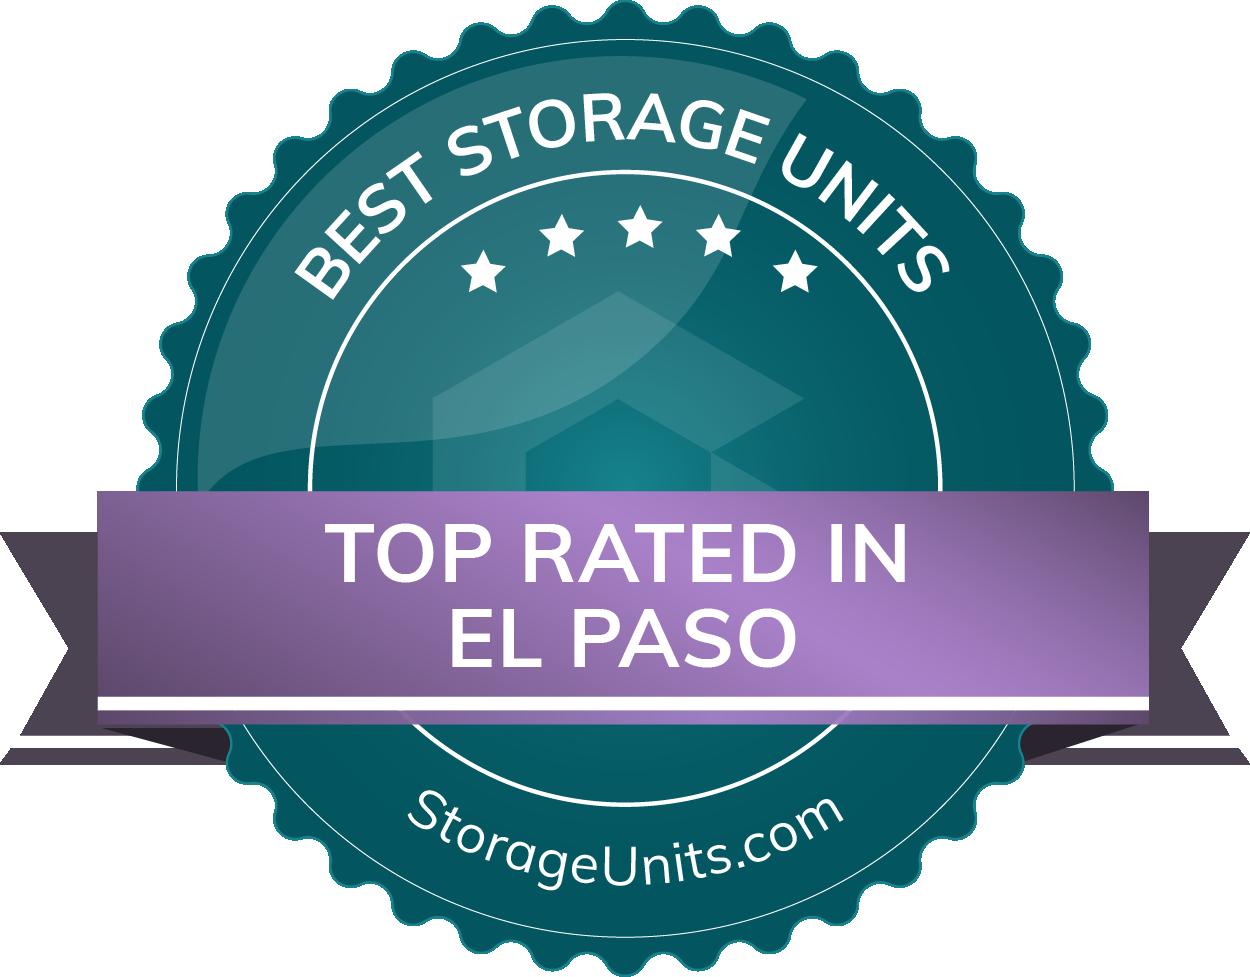 Best Self Storage Units in El Paso, TX